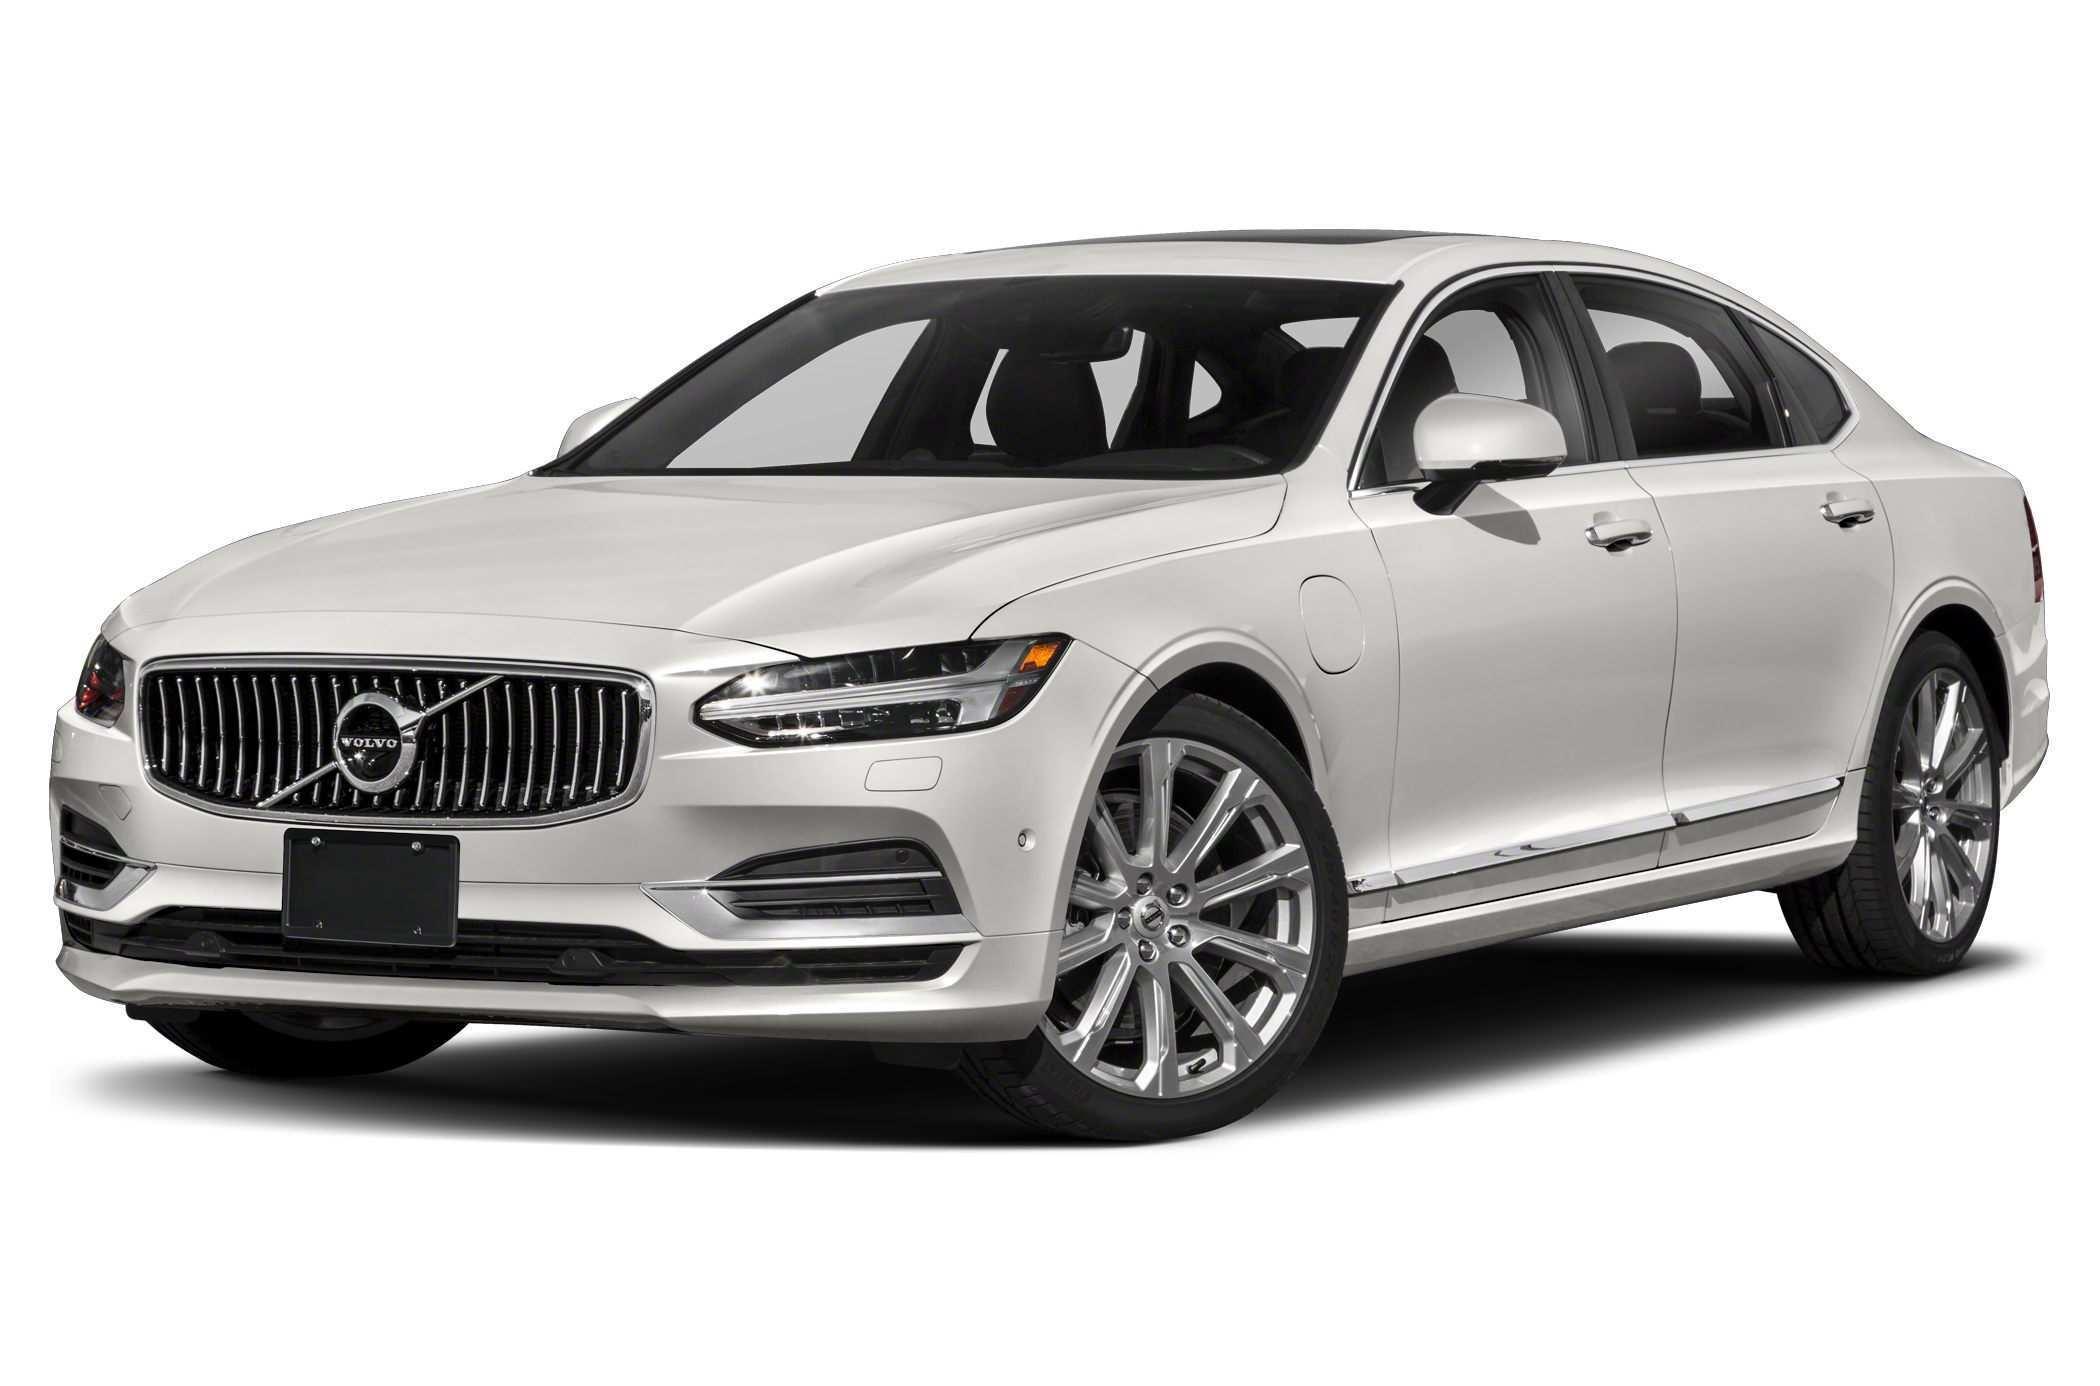 52 Gallery of Volvo Hybrid 2019 Price New Engine Specs for Volvo Hybrid 2019 Price New Engine